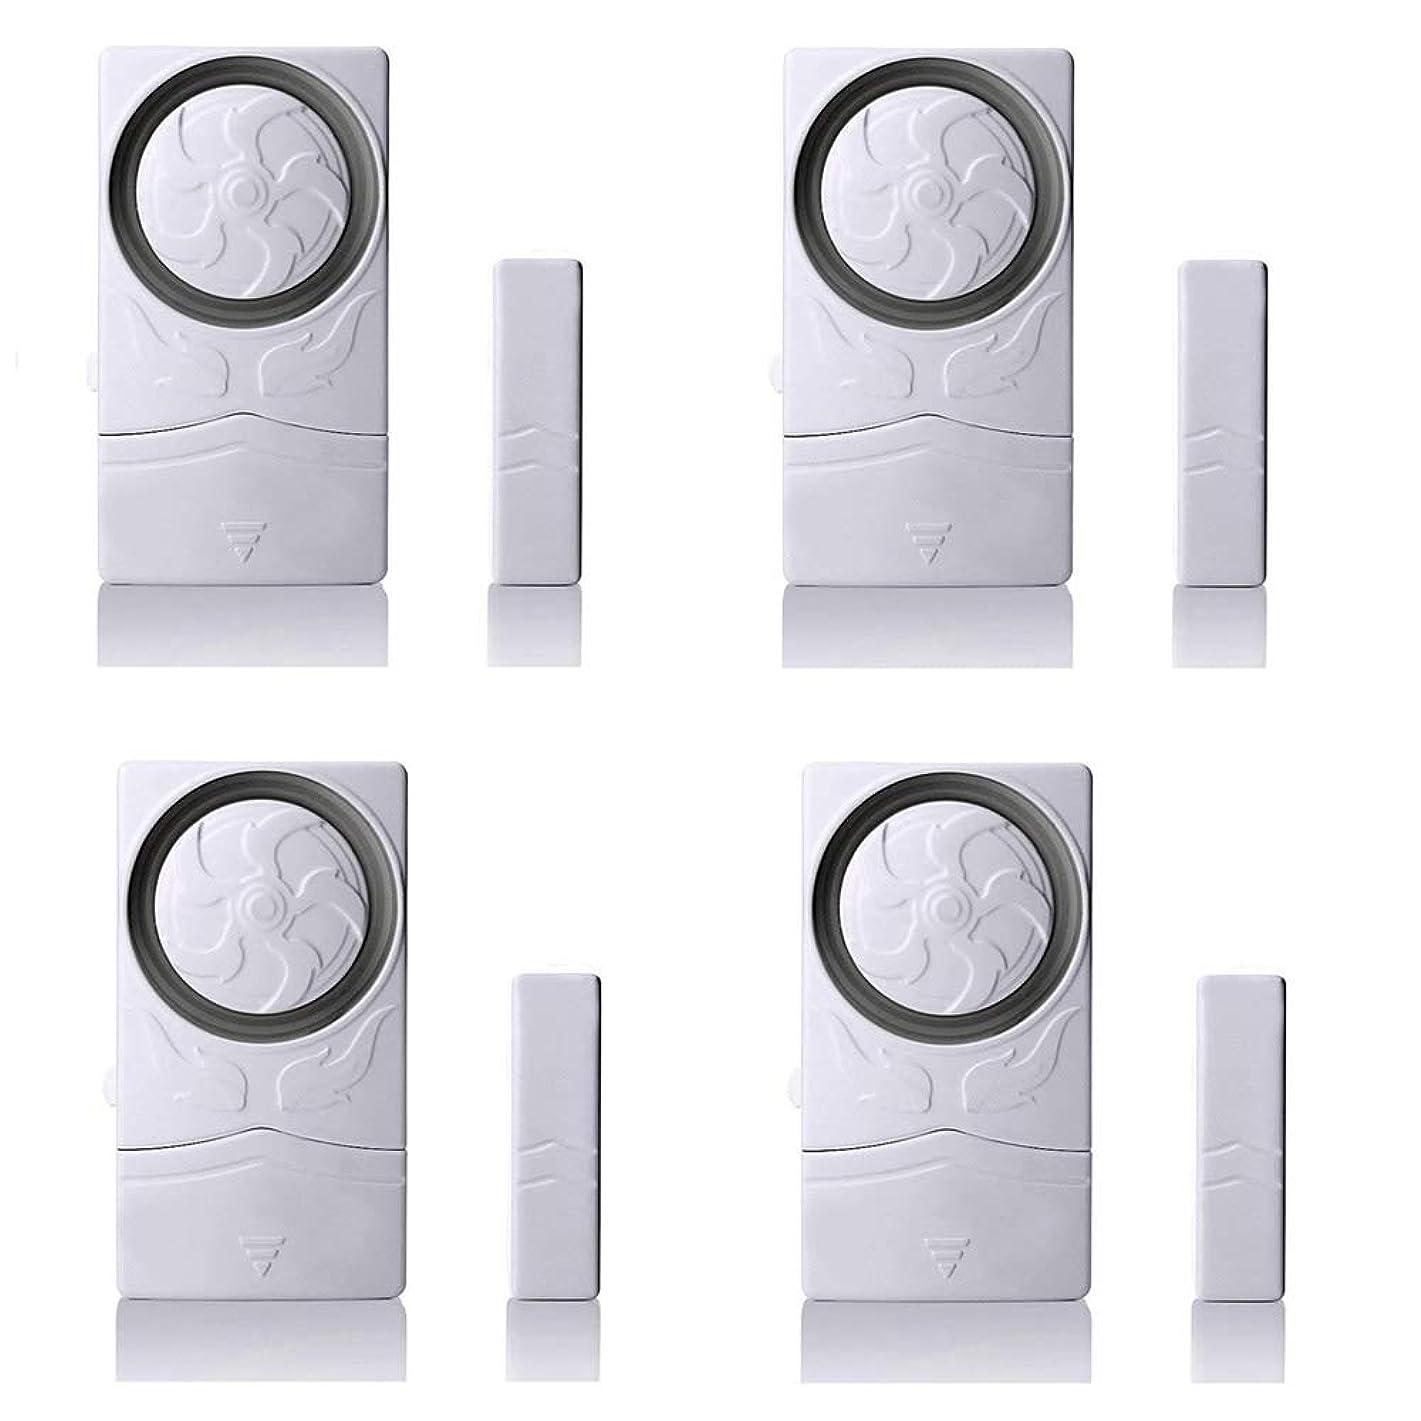 SuperInk 4 Set Wireless Entry Home Door Window Refrigerator Burglar Alarm Safety Security Burglar Alert System Magnetic Sensor Emergency Doorbell Chime